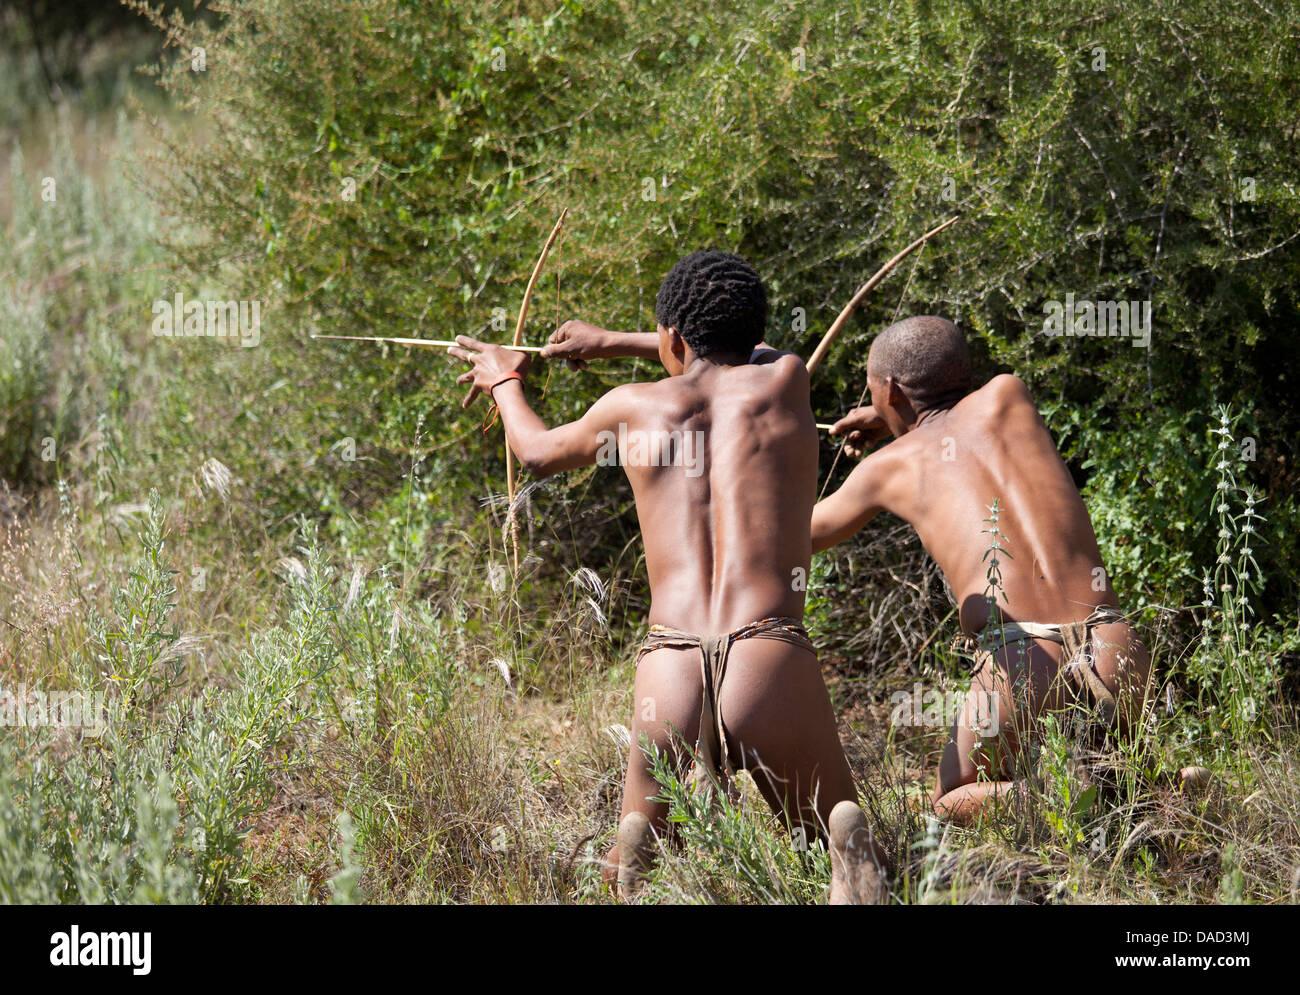 San (Buschmänner) demonstrieren traditionelle Jagdtechnik bei Okahandja Cultural Village, nahe der Stadt Okahandja, Stockbild